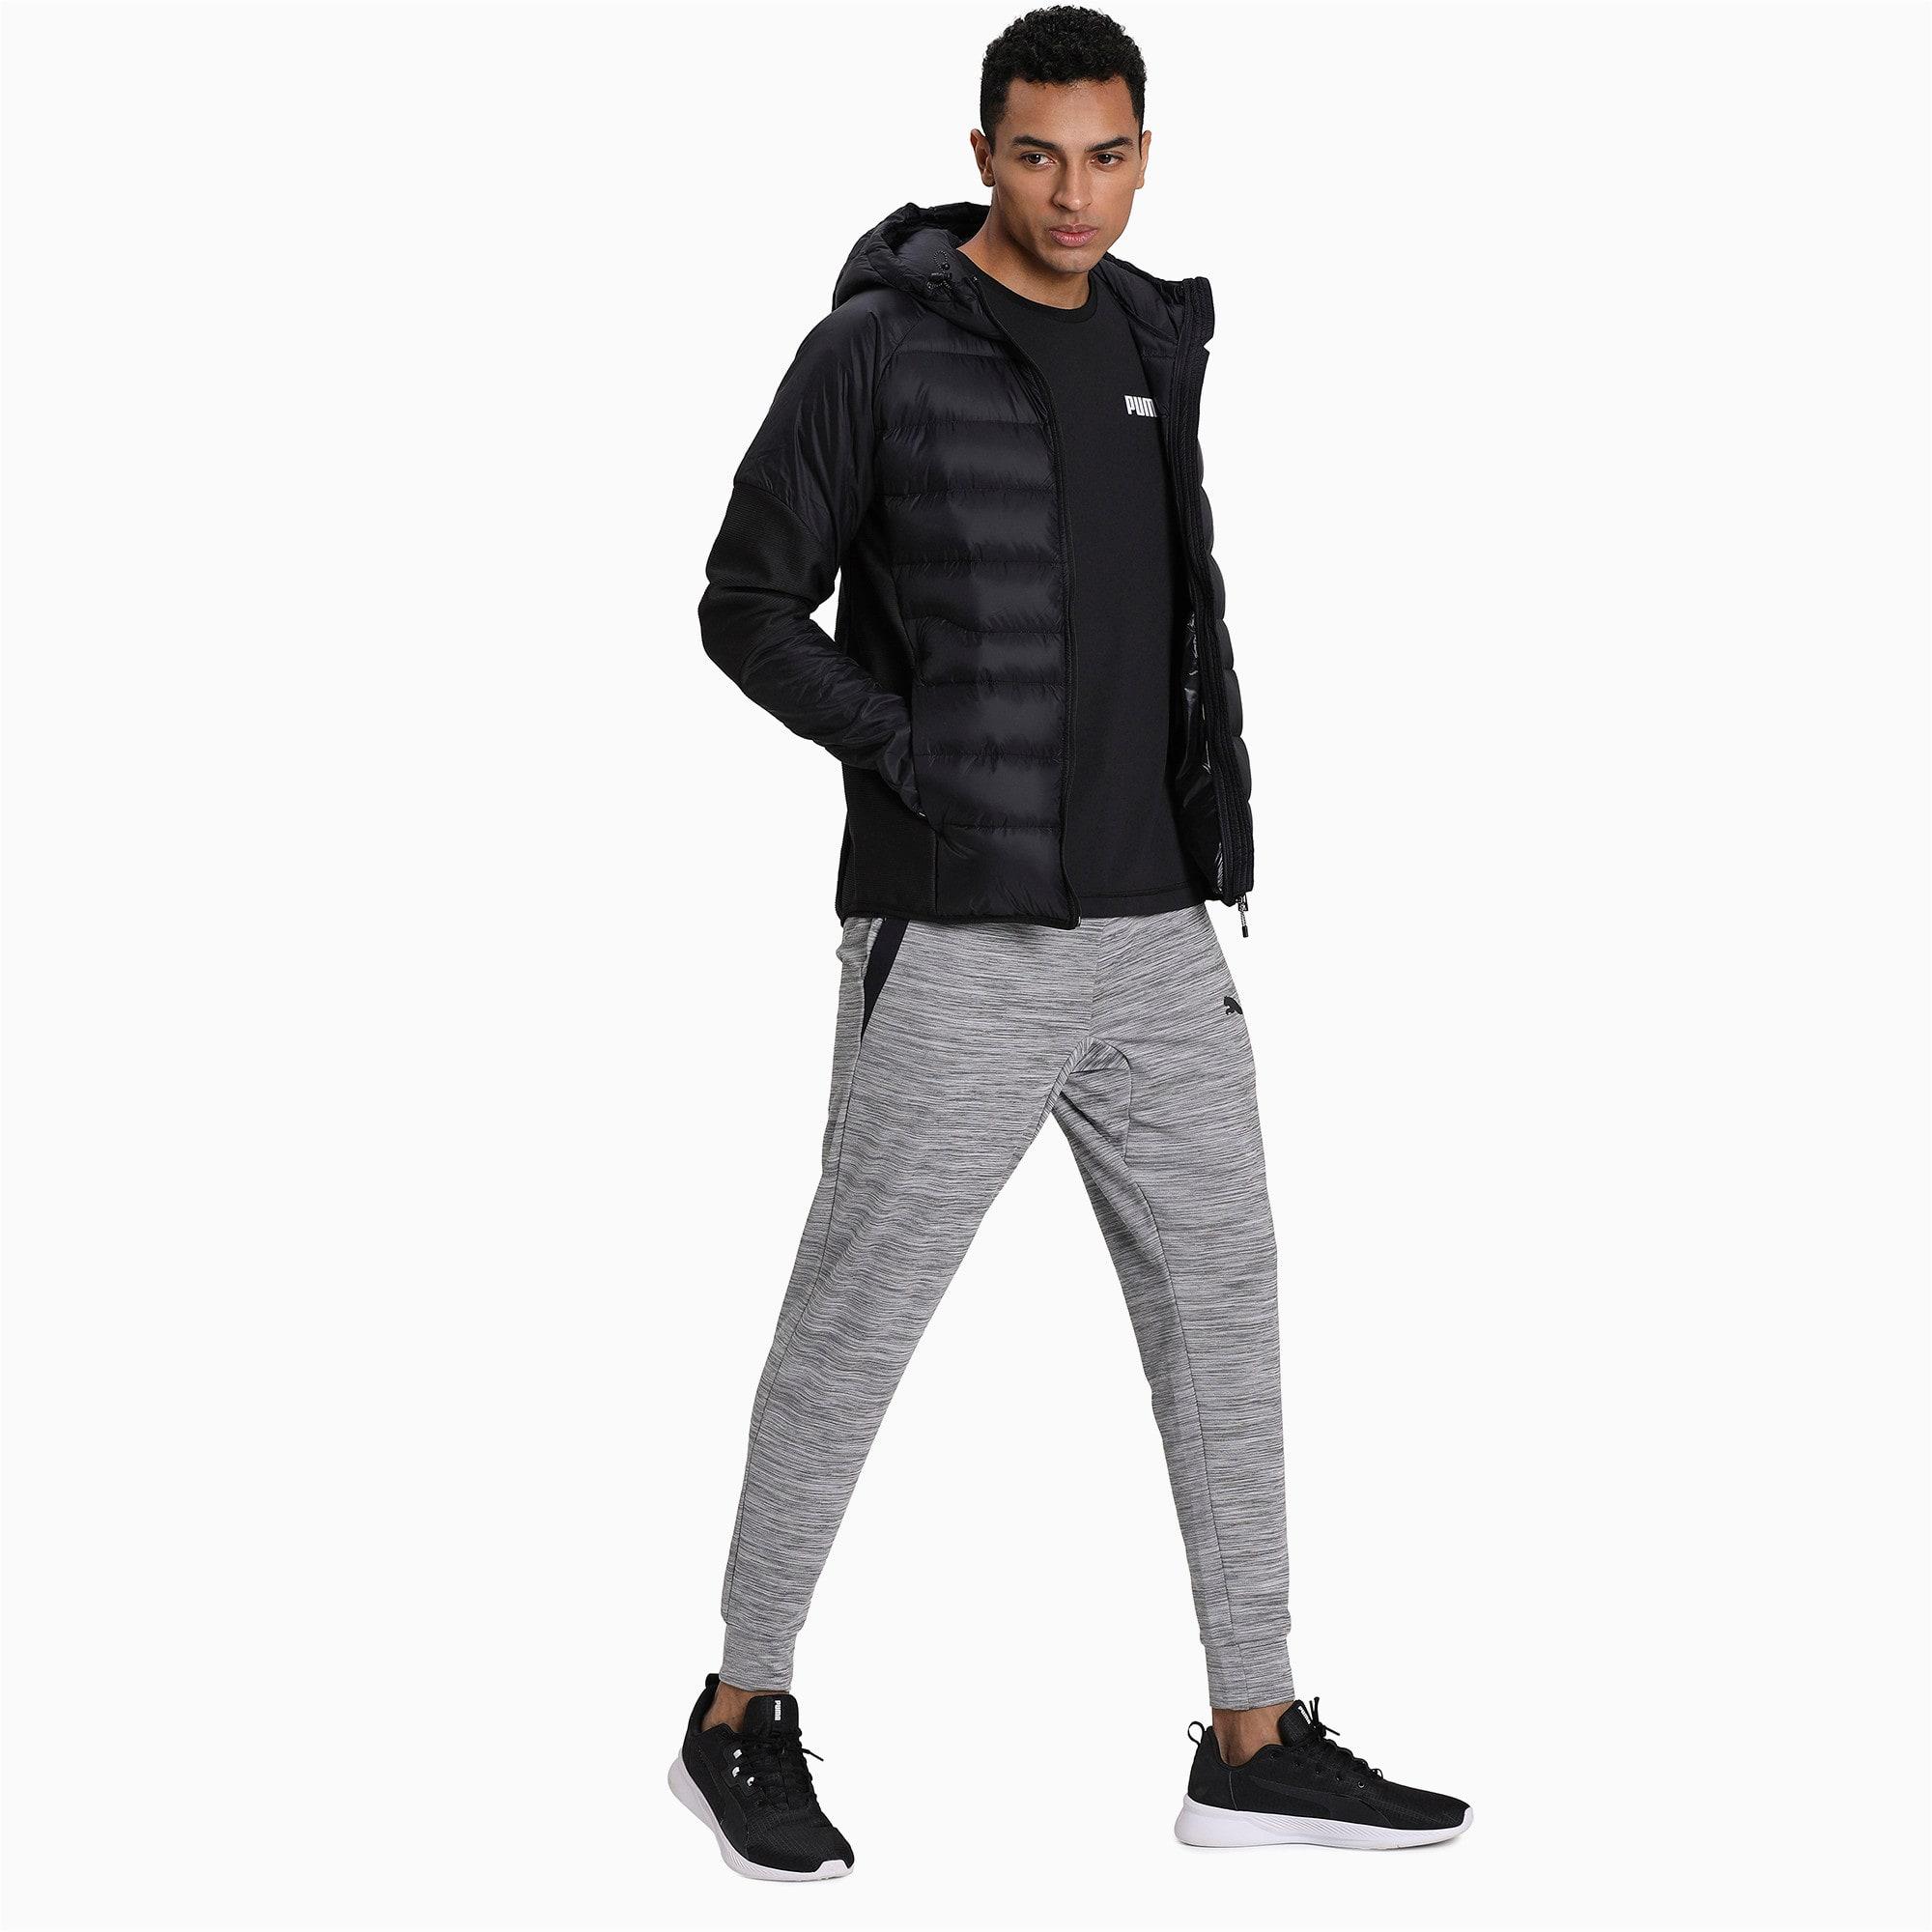 Thumbnail 3 of 600 Hybrid Down Men's Jacket, Puma Black, medium-IND